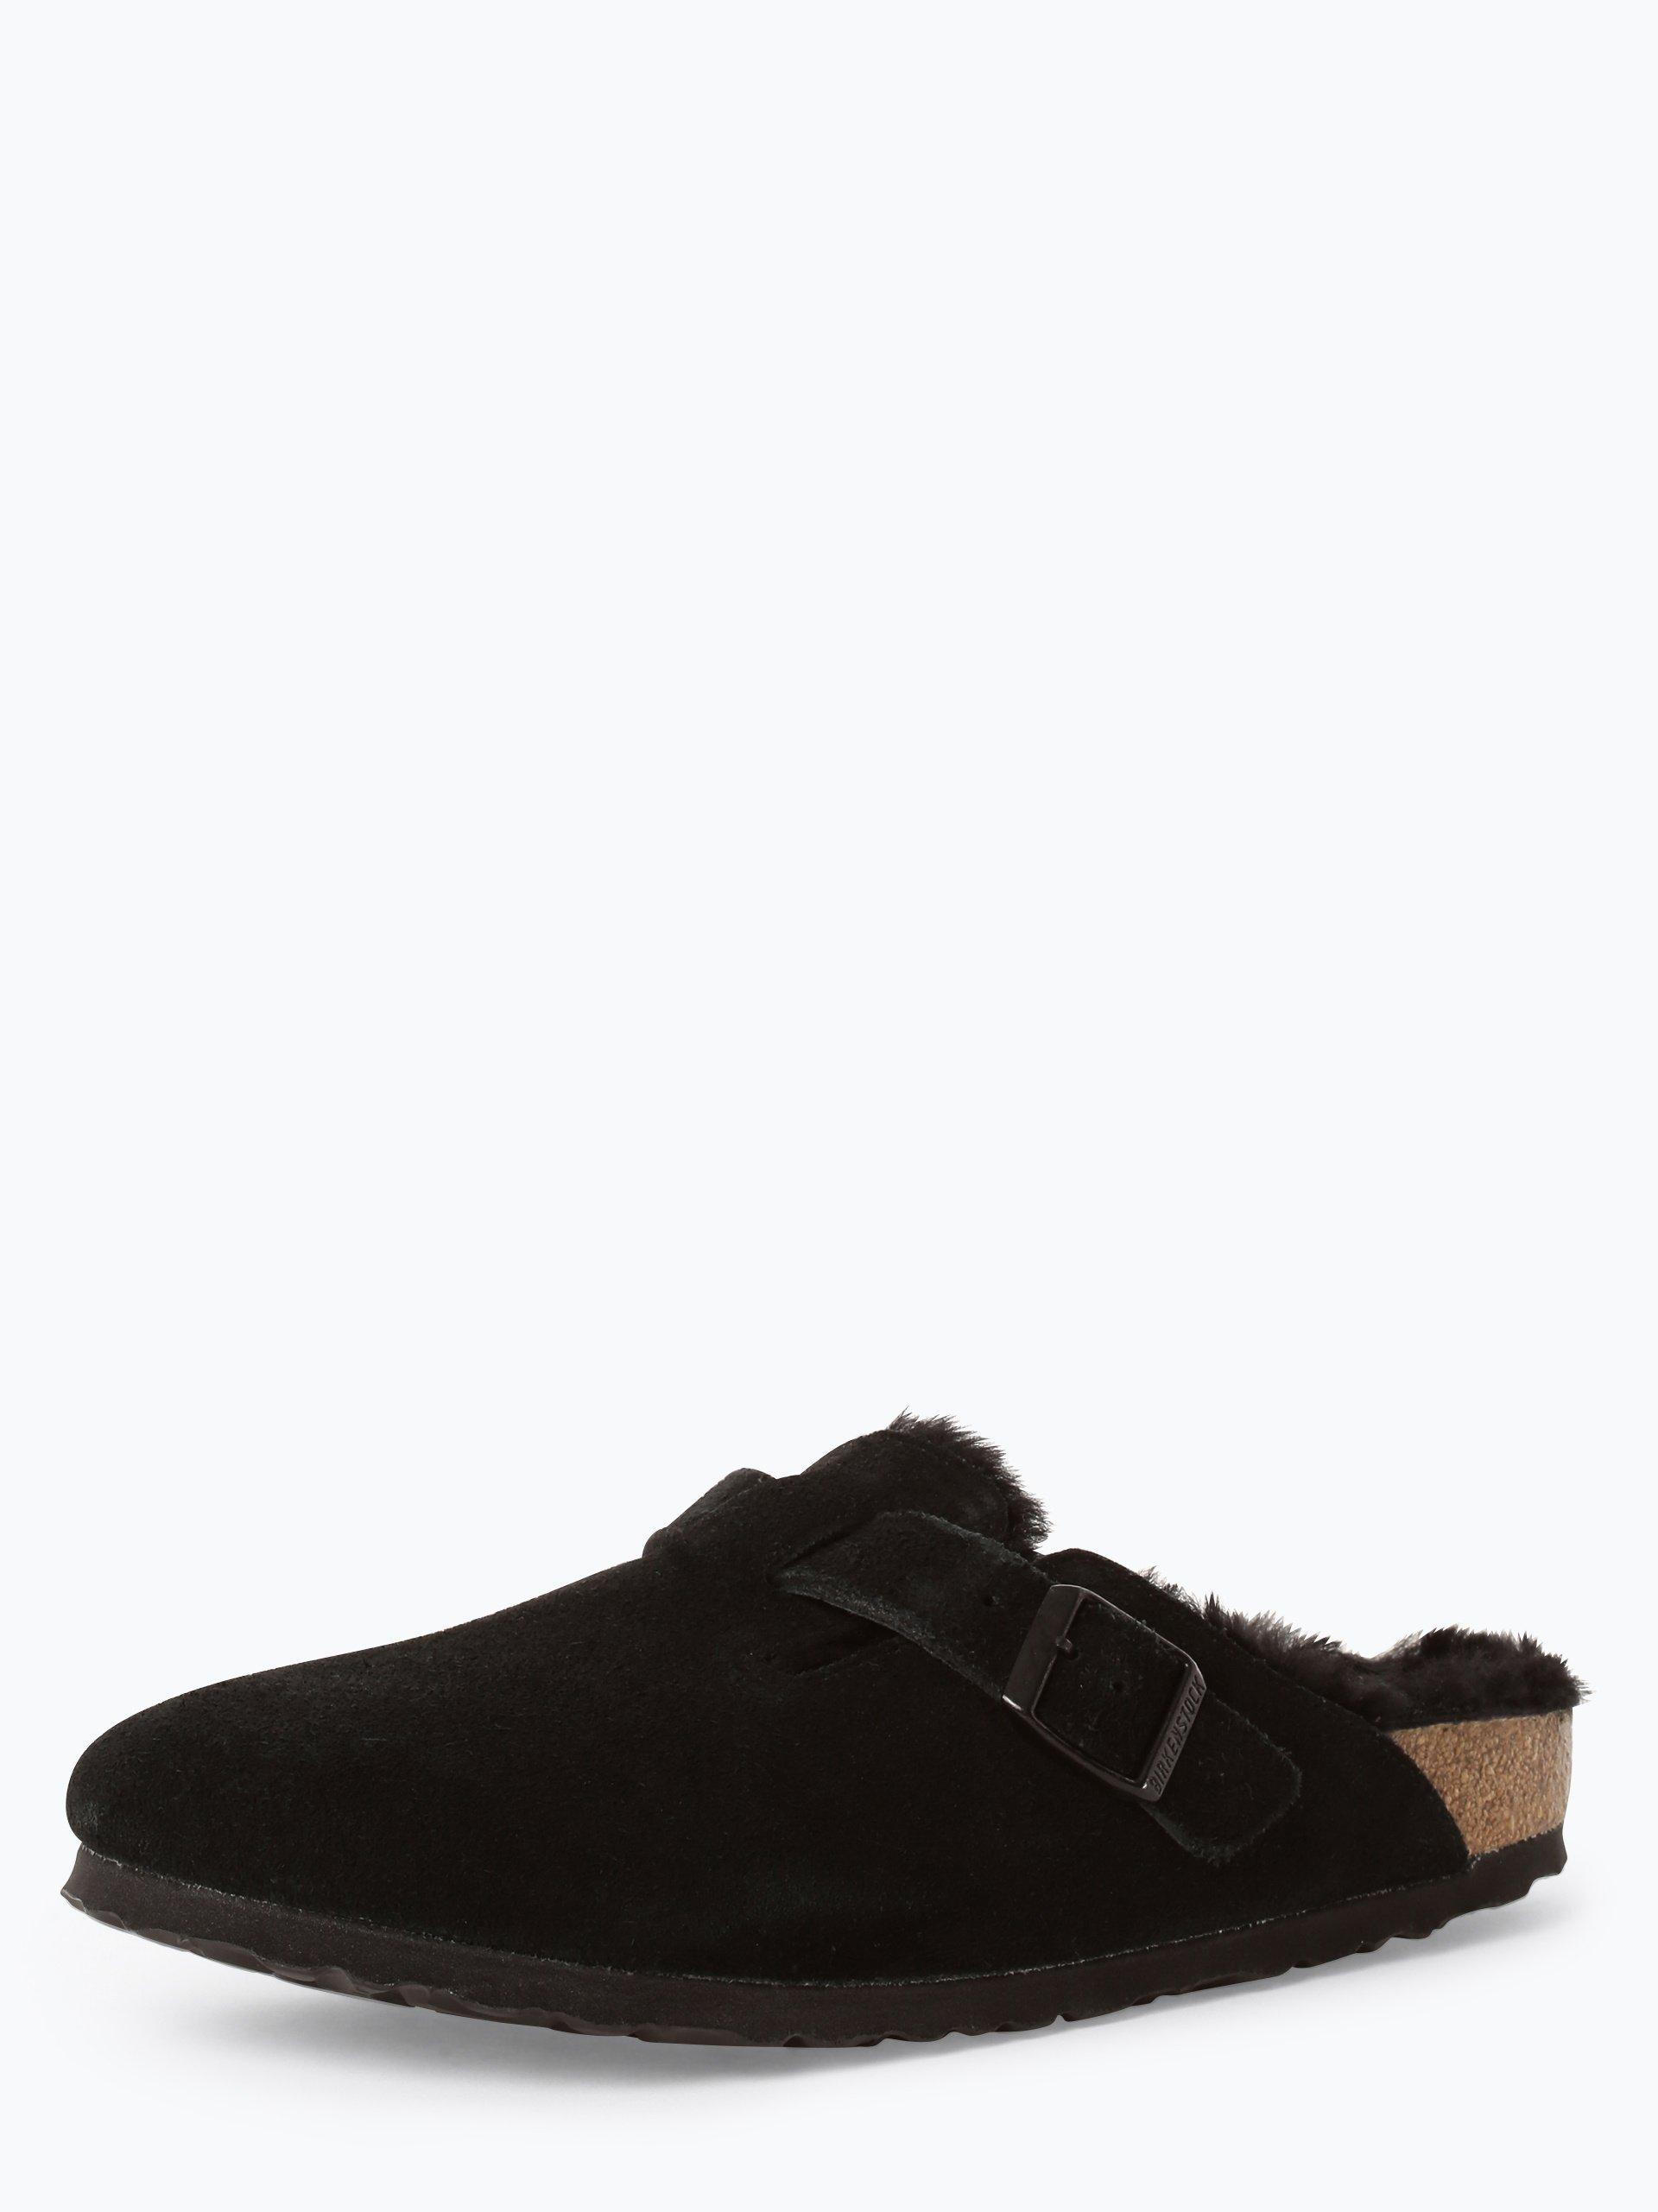 Birkenstock Damen Sandalen aus Leder - Boston Fur